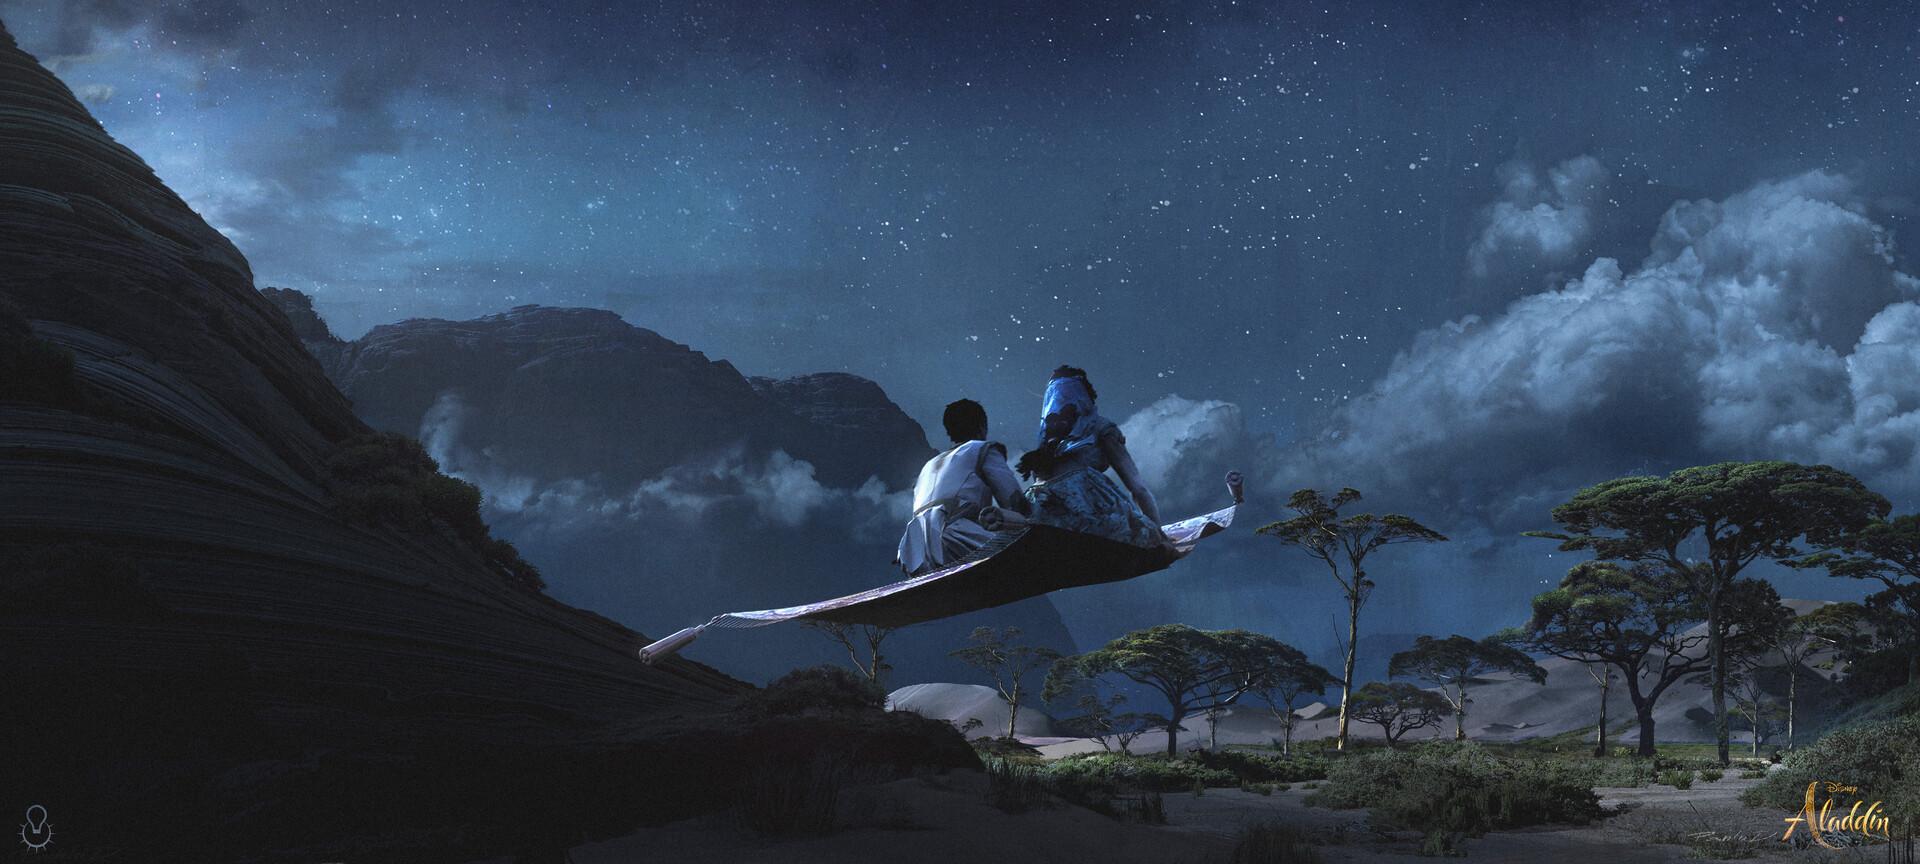 Aladdin [Disney - 2019] - Page 43 Pablo-dominguez-sl-wnw0390-leaving-petra-v009-002-pd